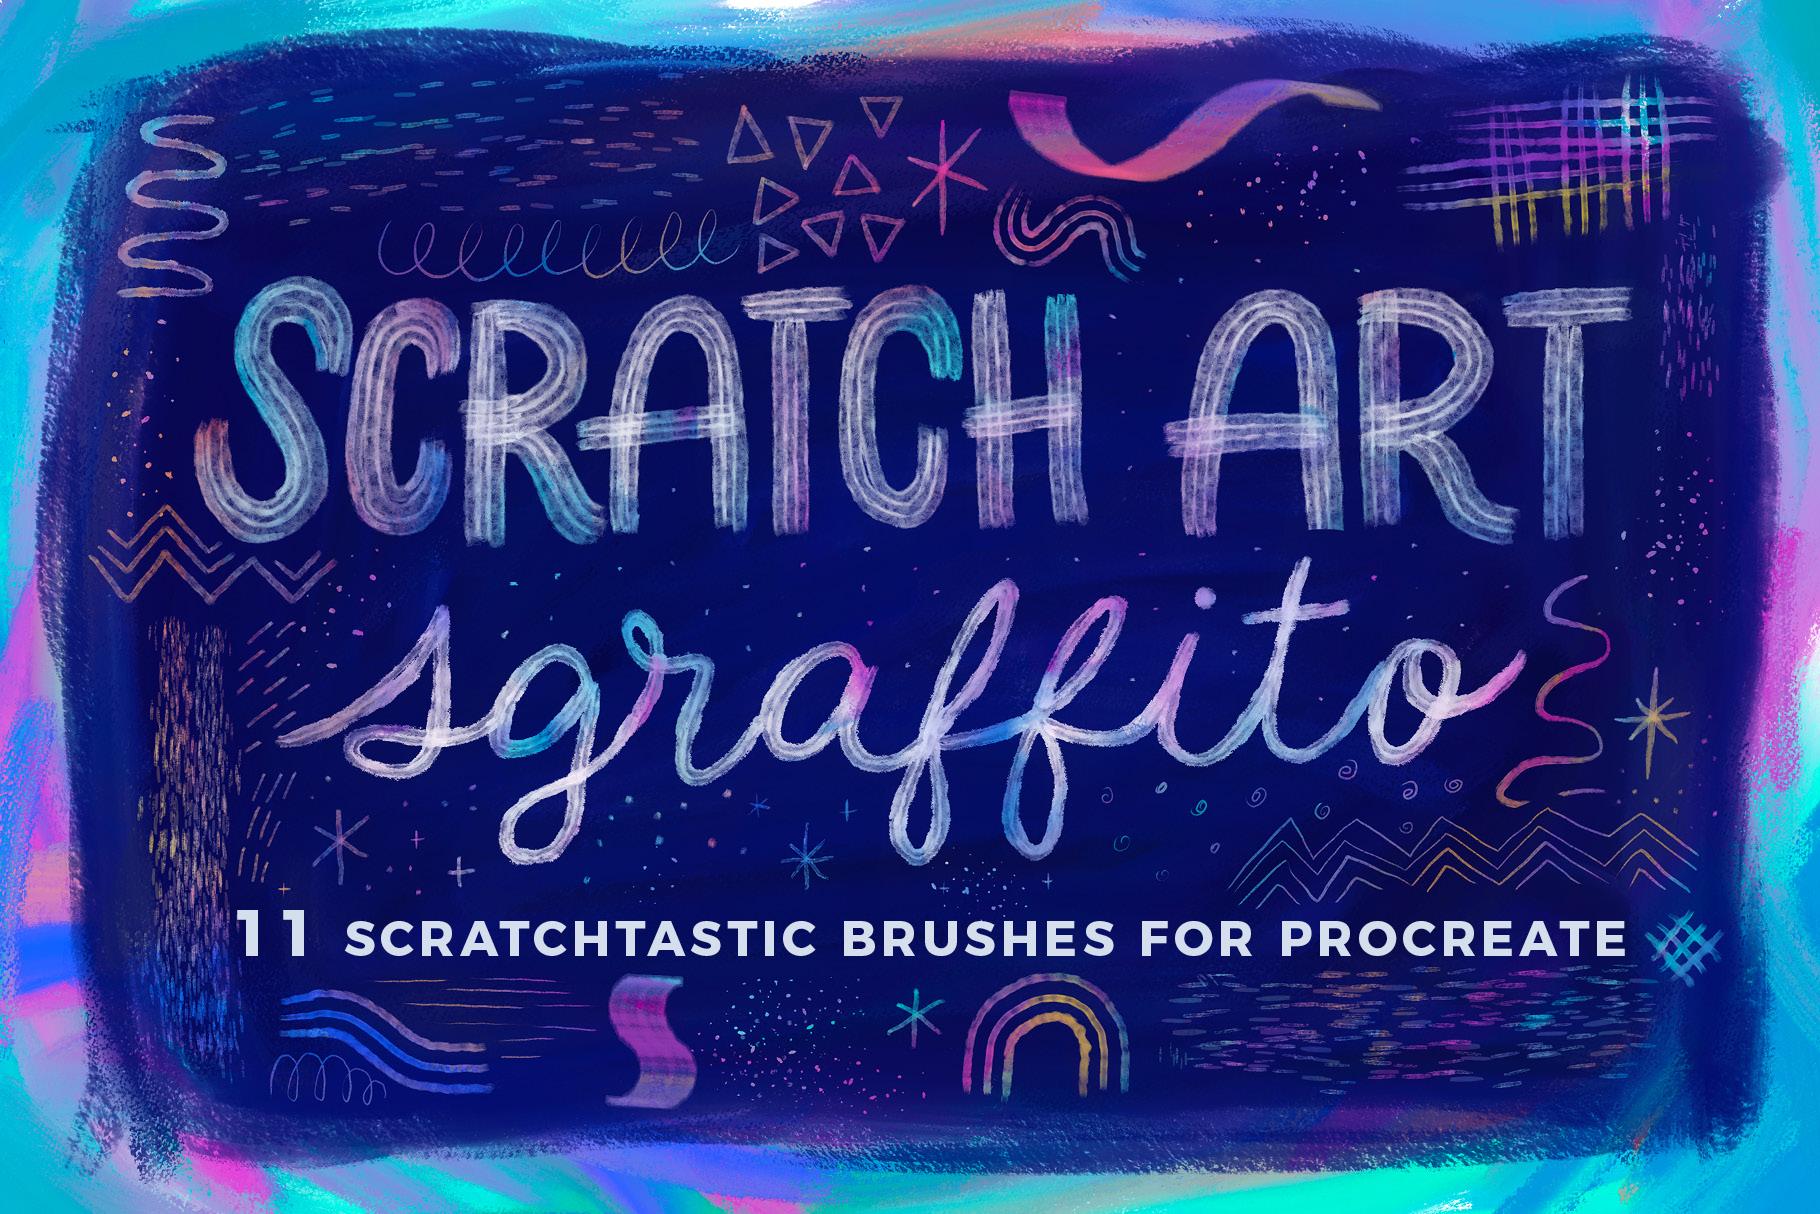 Scratch Art Sgraffito